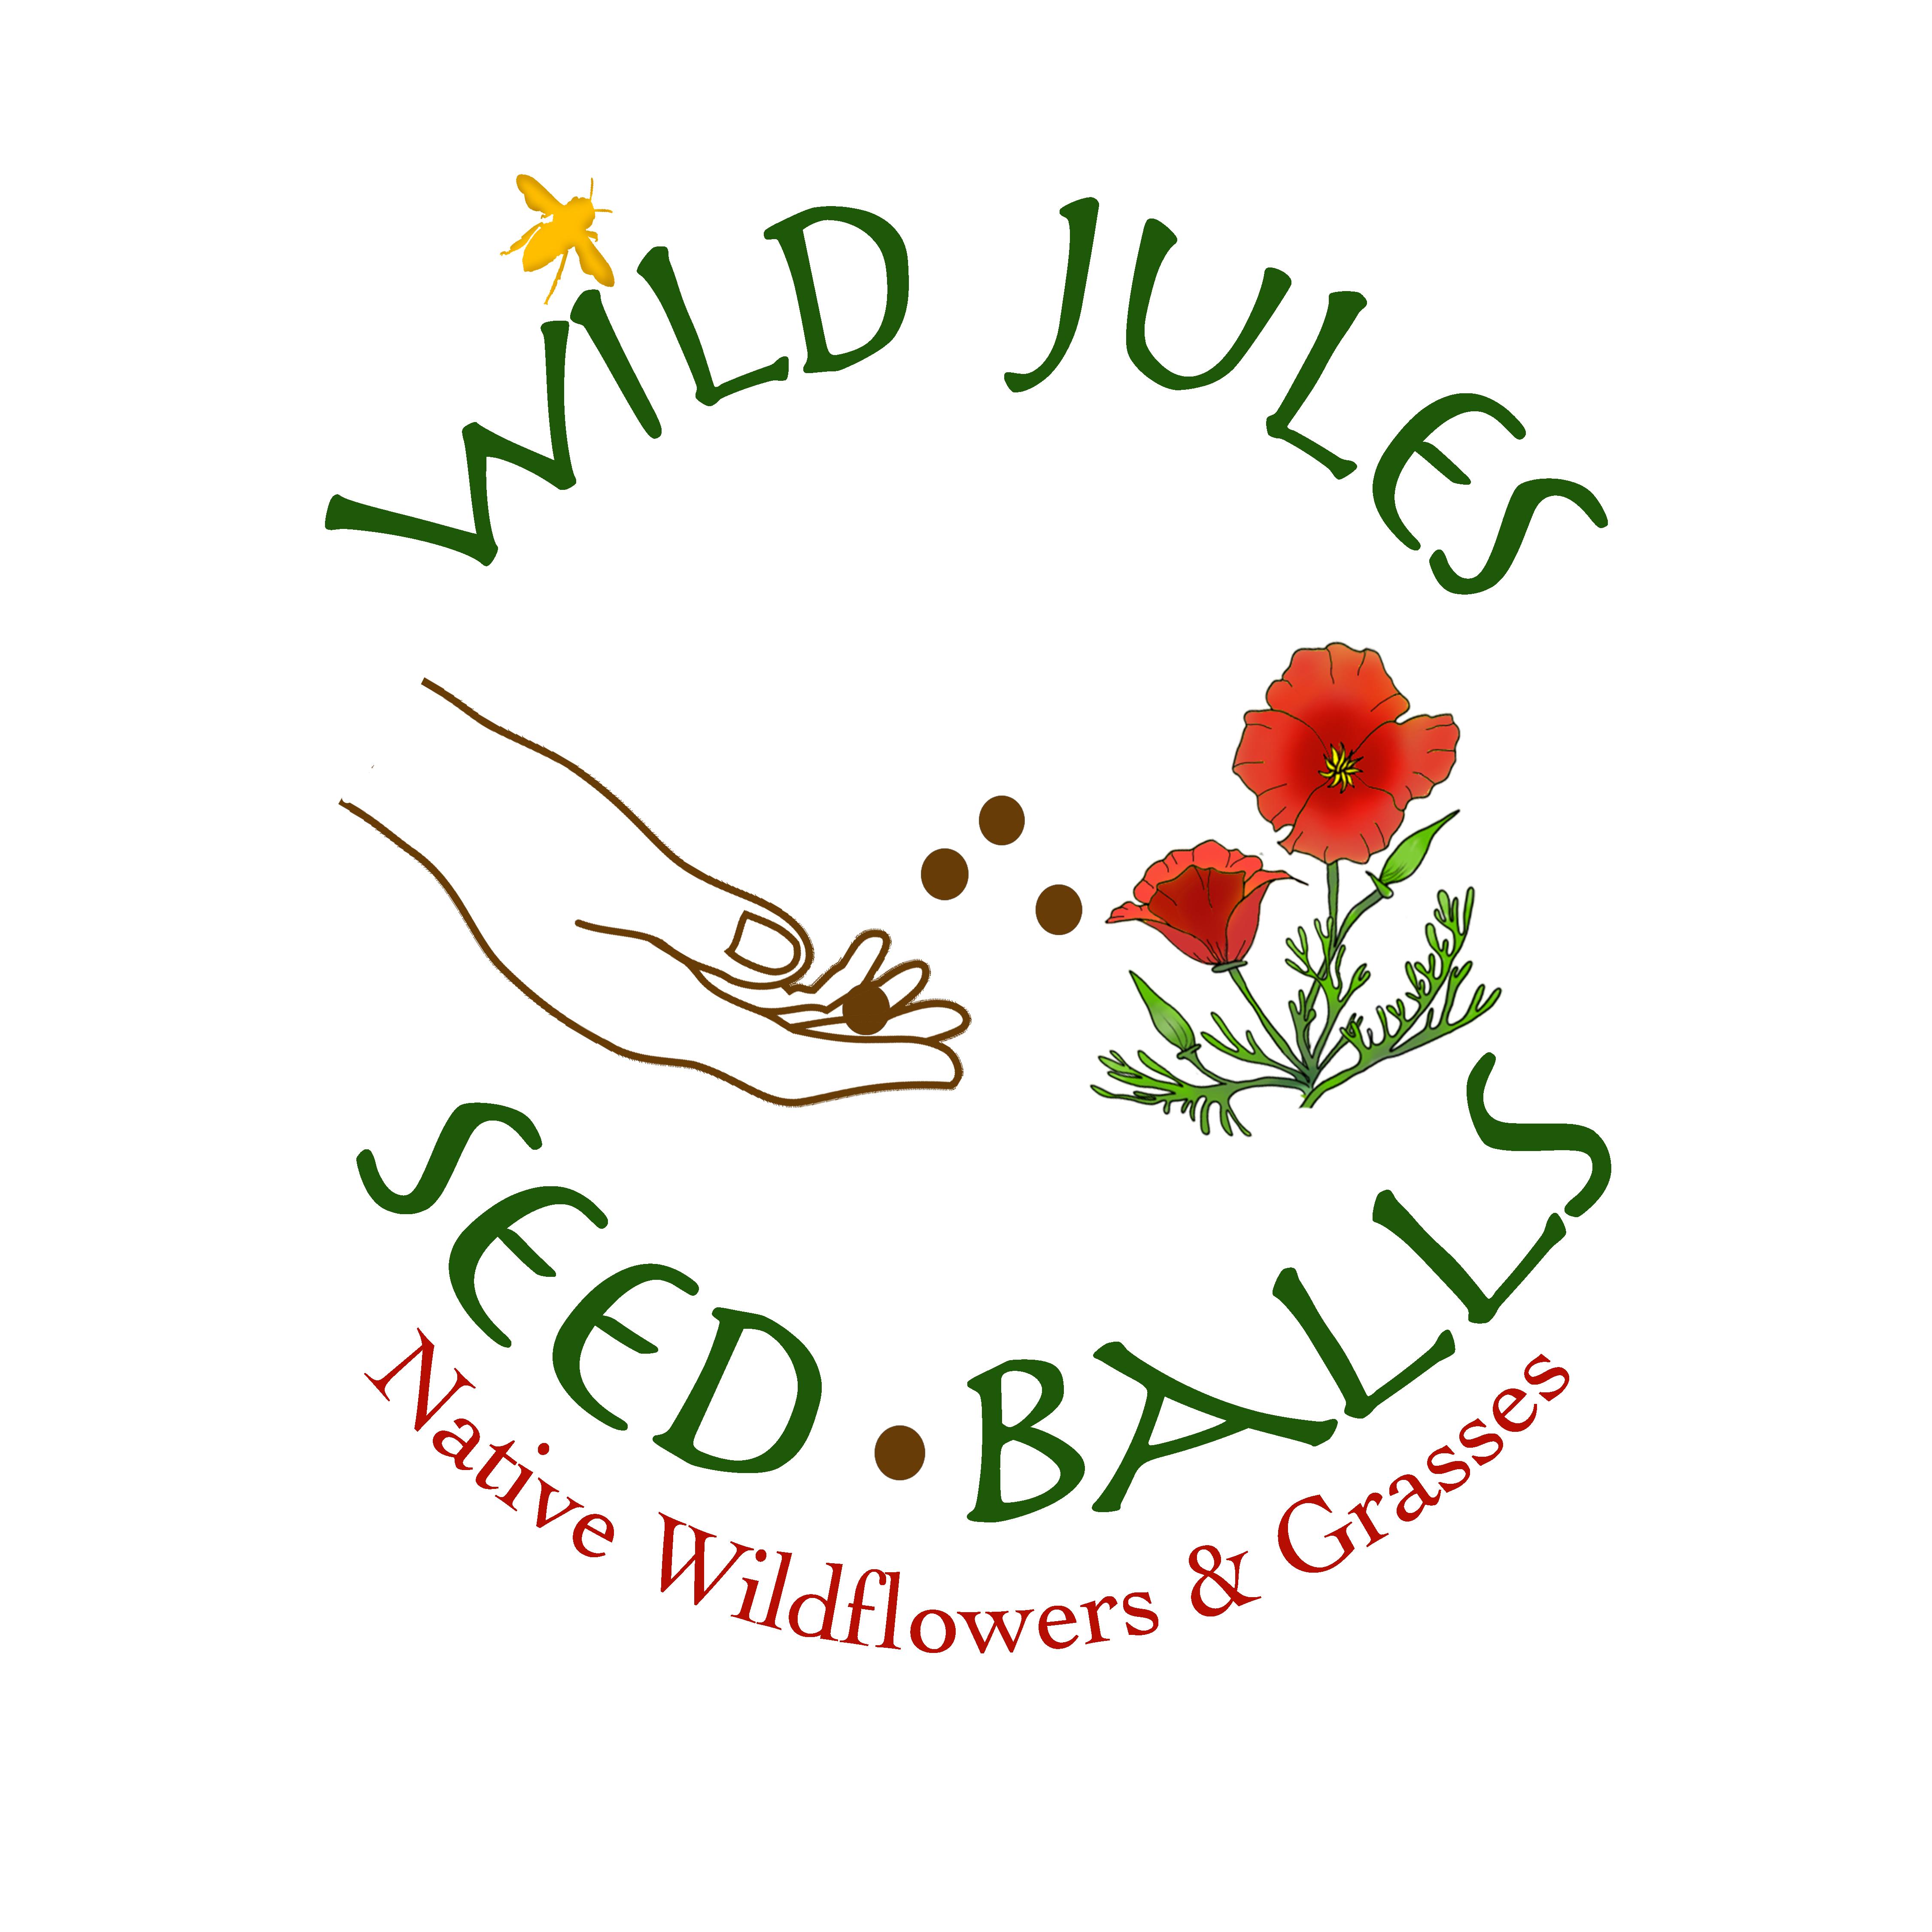 Wild Jules